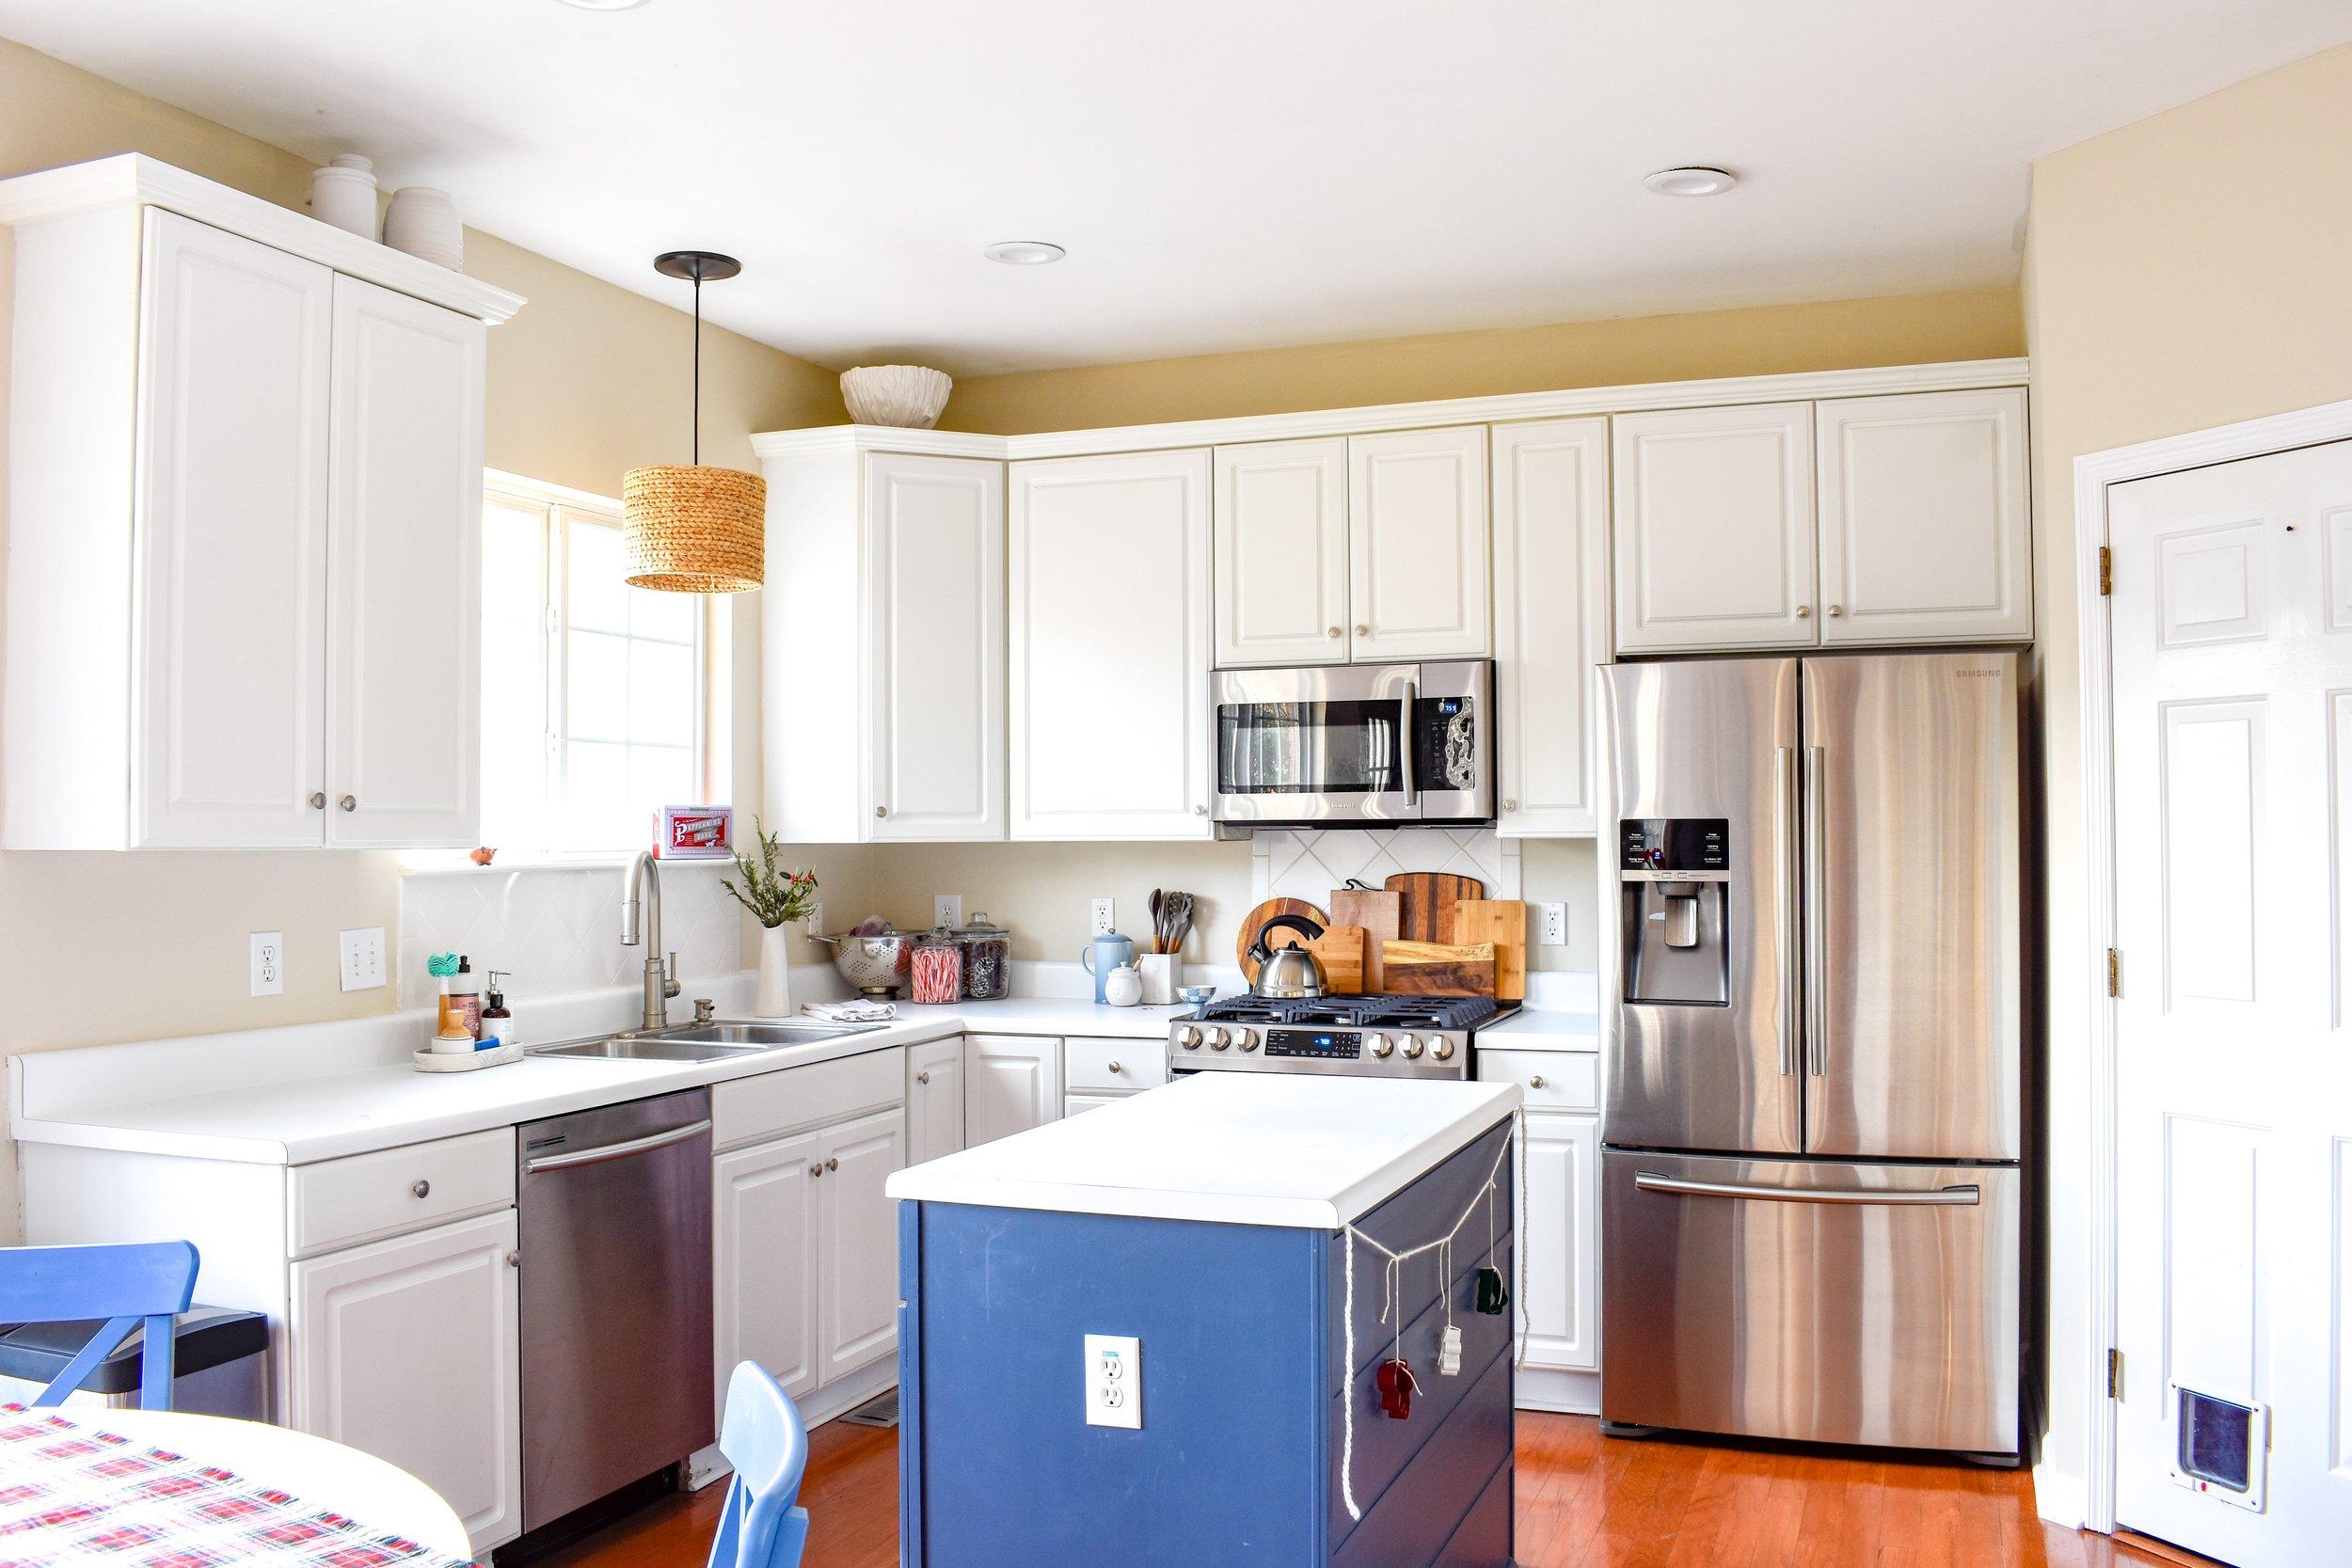 Winter Kitchen Updates - Our 2 year, slow process kitchen makeover.